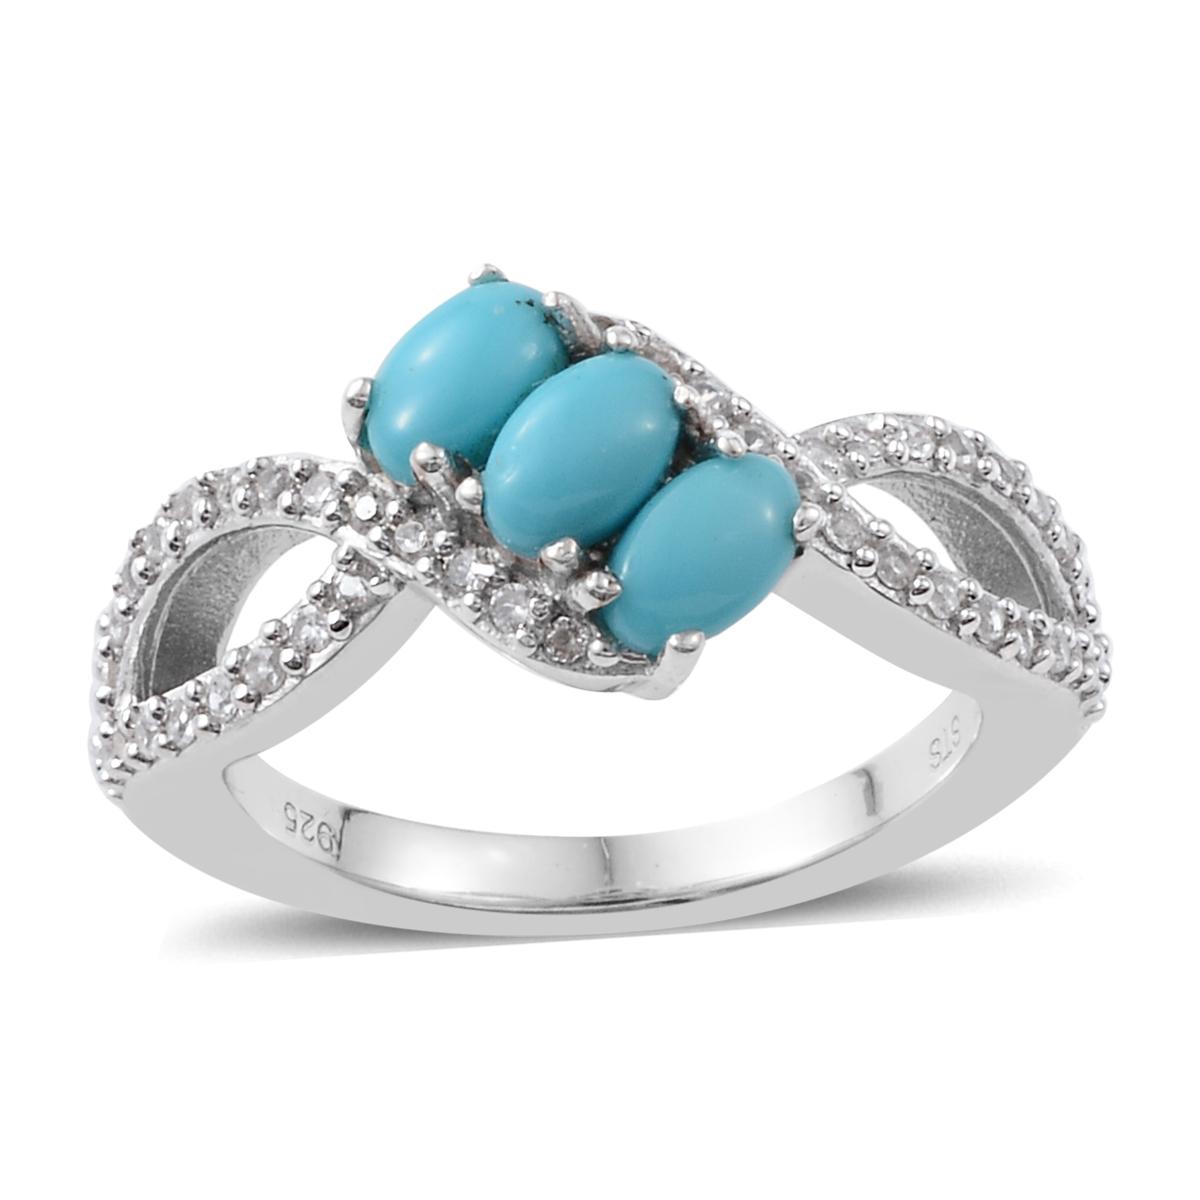 b3dfddcd349eb4 Silver Platinum Plated Sleeping Beauty Turquoise Zircon Split Ring ...